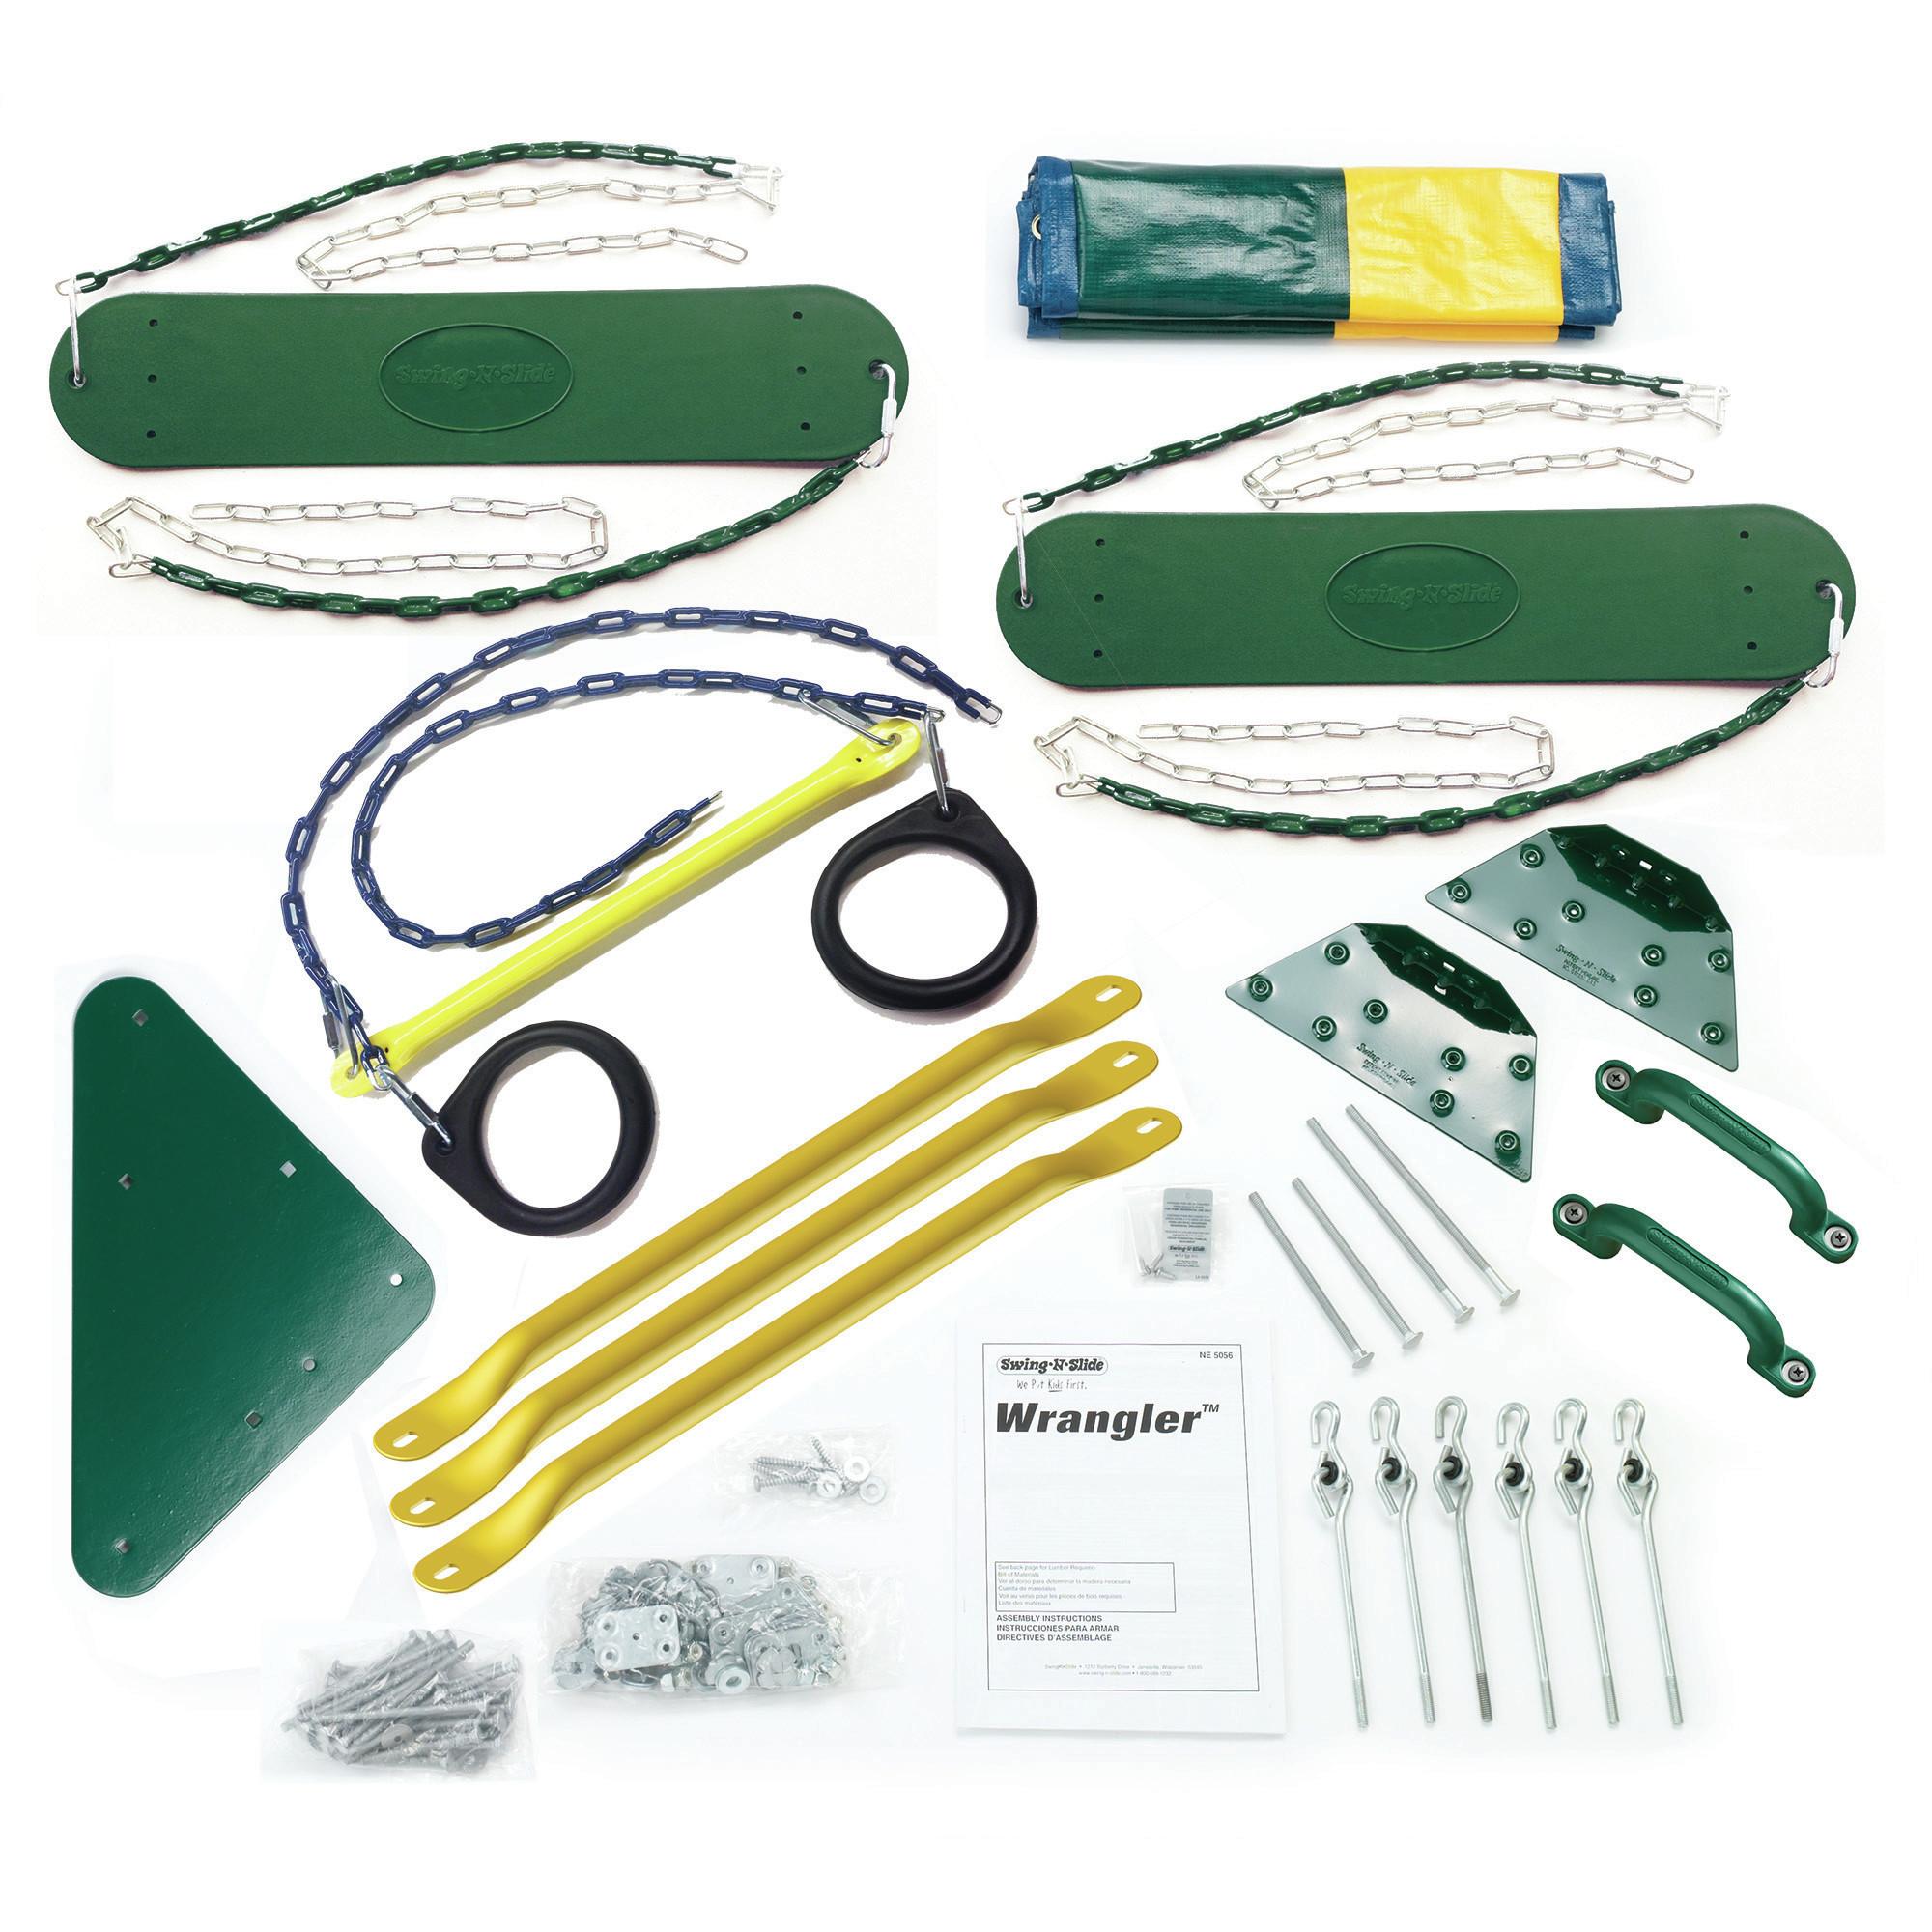 Best ideas about DIY Swing Set Hardware Kits . Save or Pin Swing n Slide Wrangler Custom DIY 12 Piece Swing Set Now.